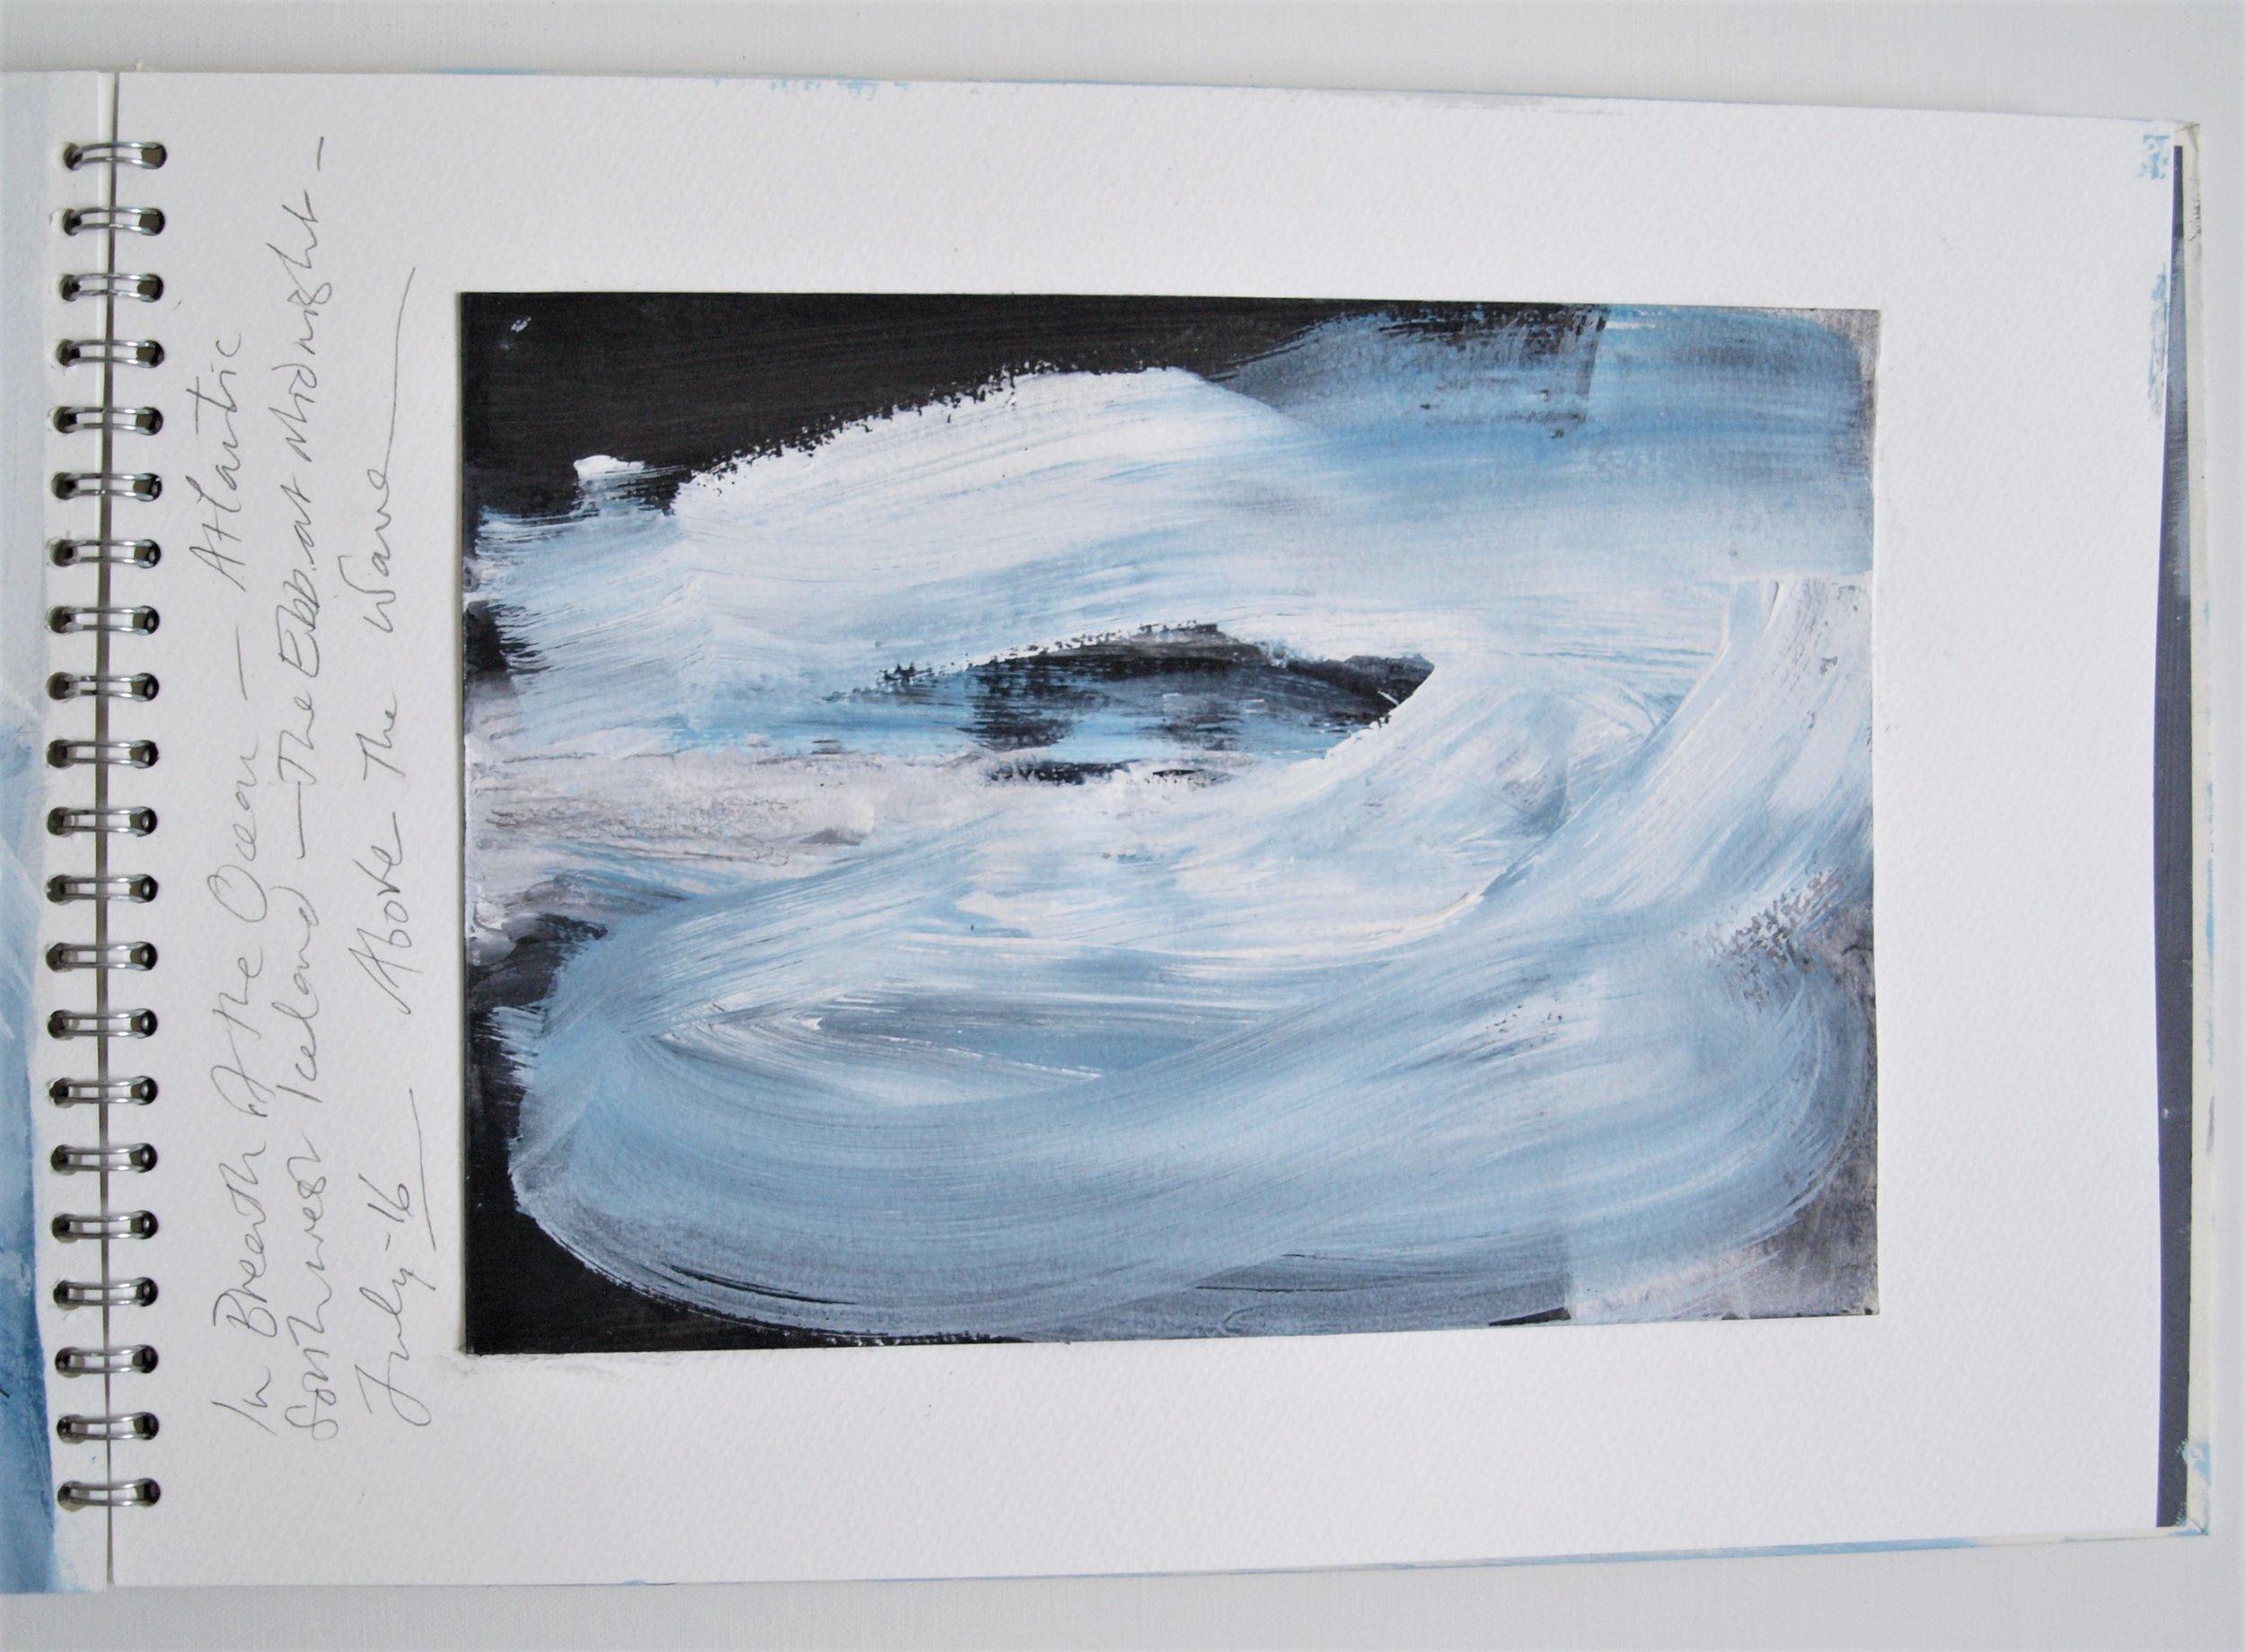 ICELAND LIGHT INTO DARK Sketchbook 2016 (page 22) C.G.GUEST.JPG